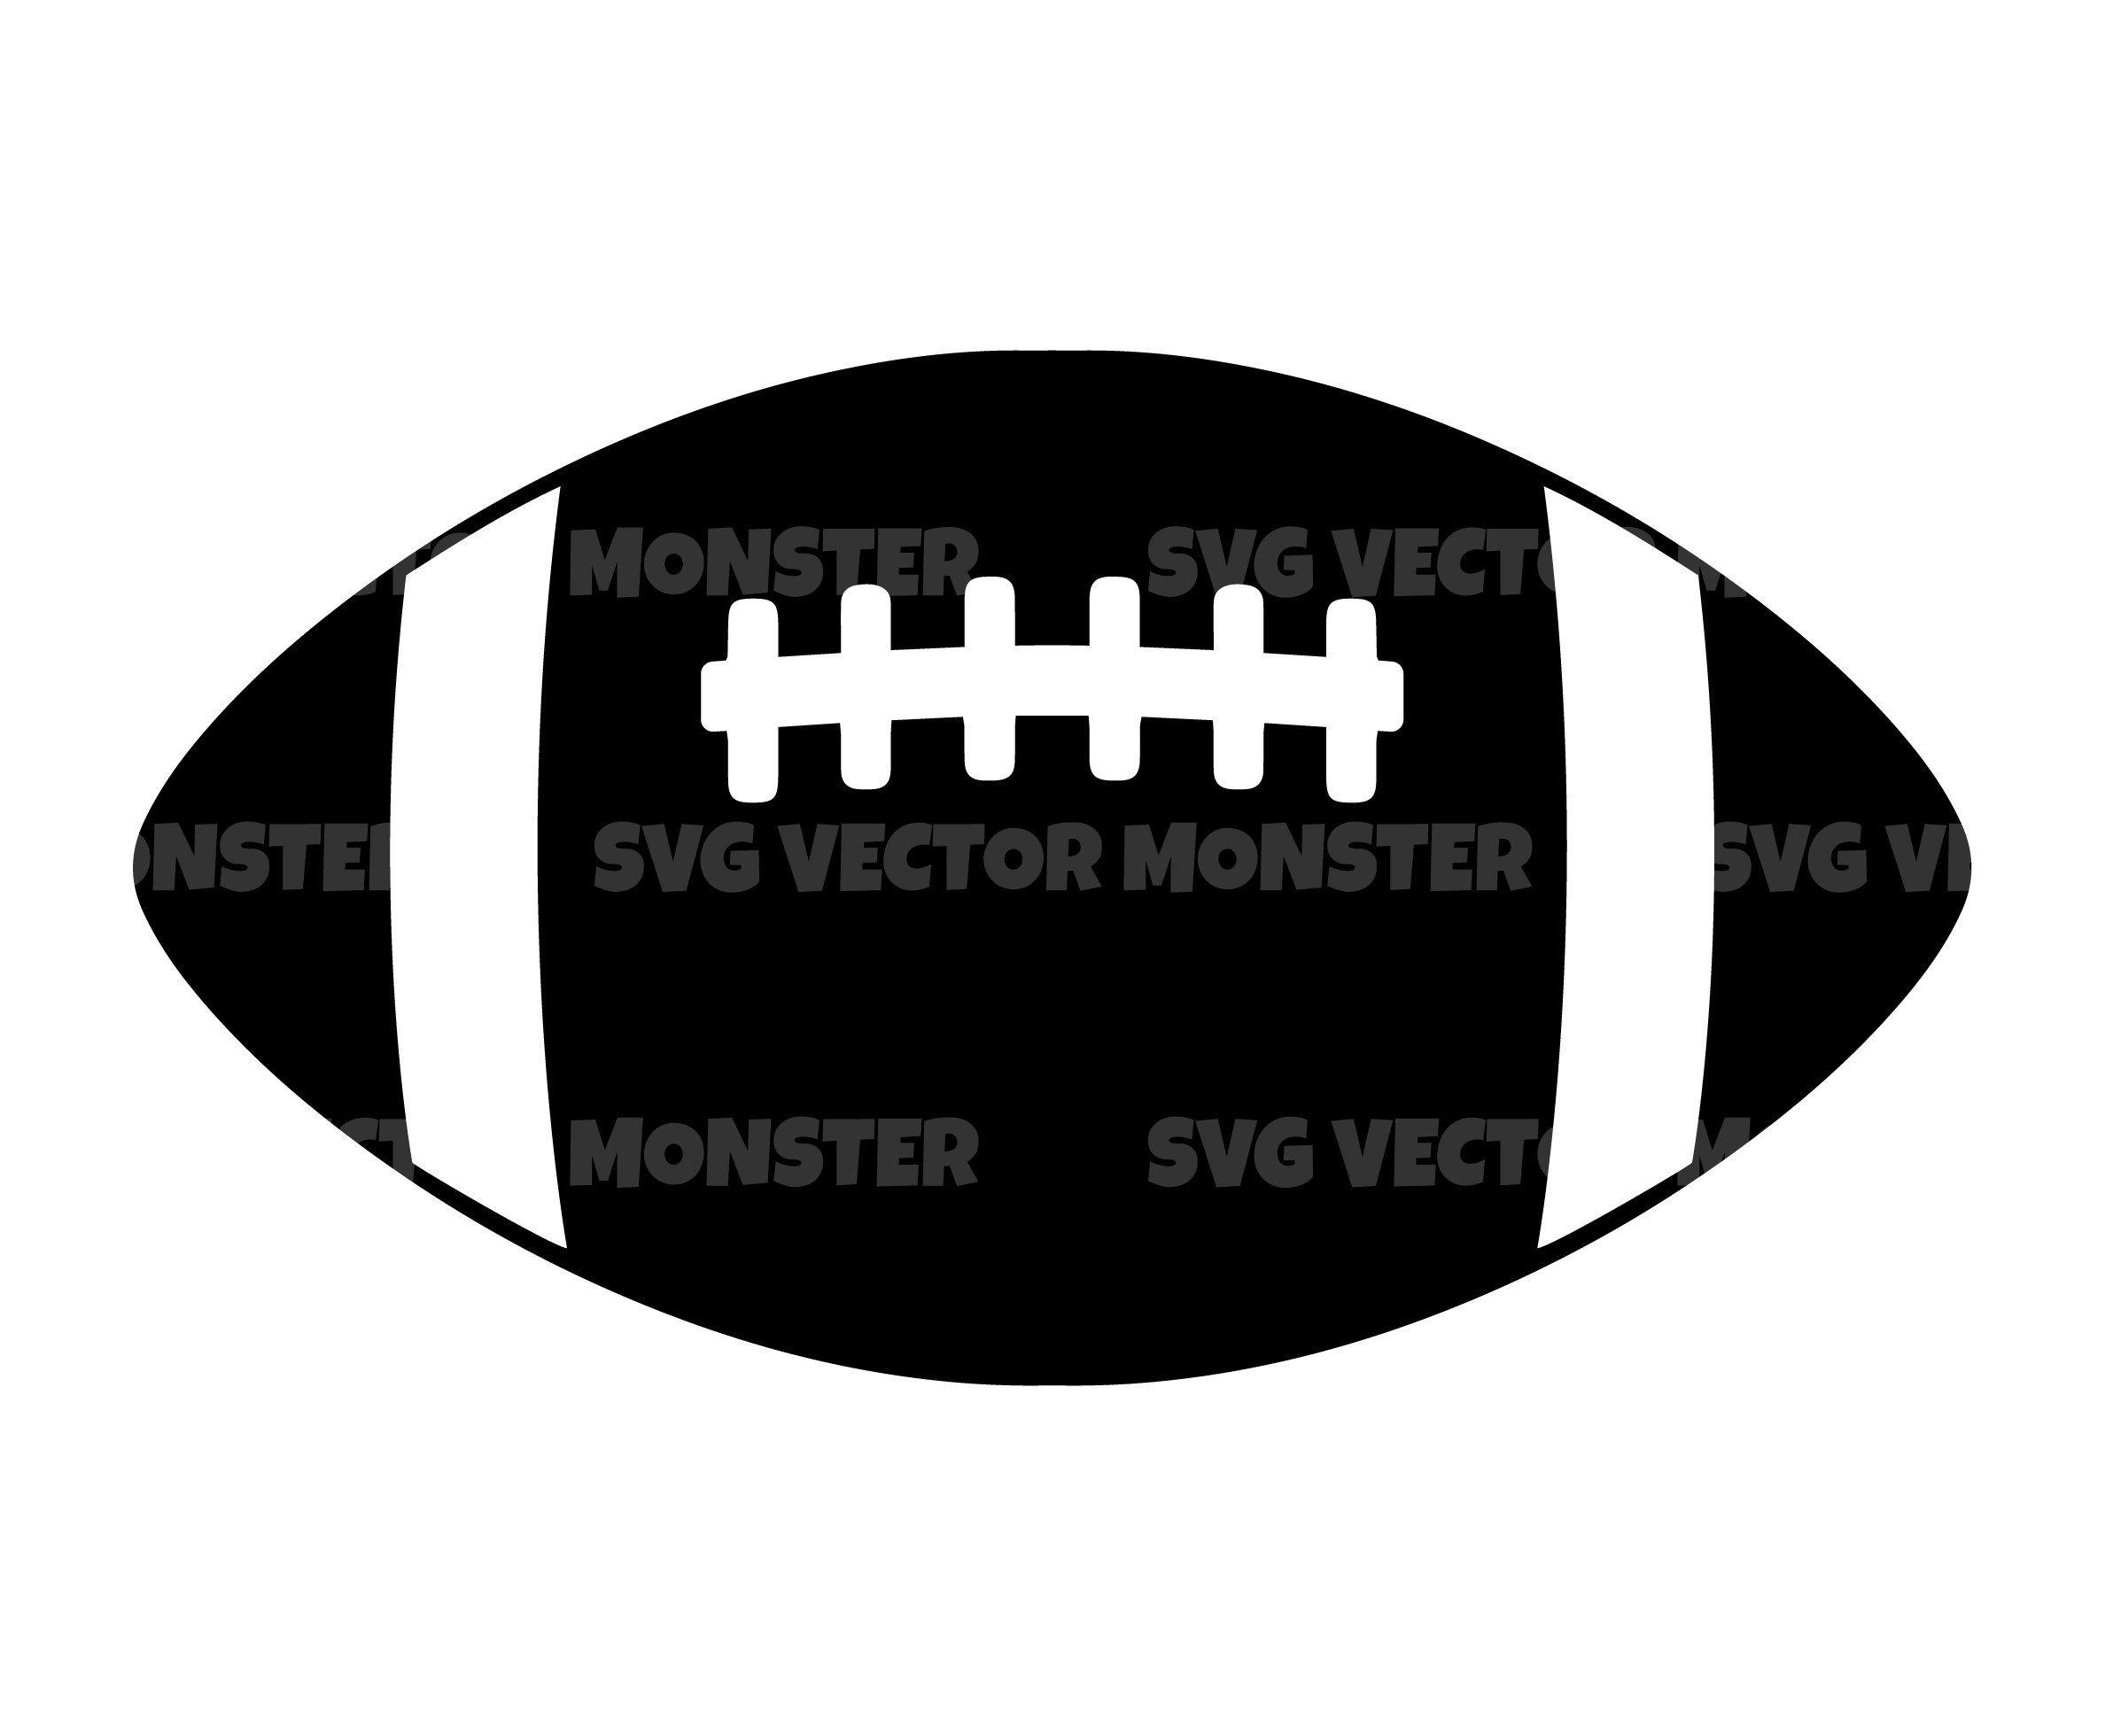 Football Ball Svg Ball SVG Football Cut File Football Svg Football American Ball SVG Vector. Football Clipart Football American SVG